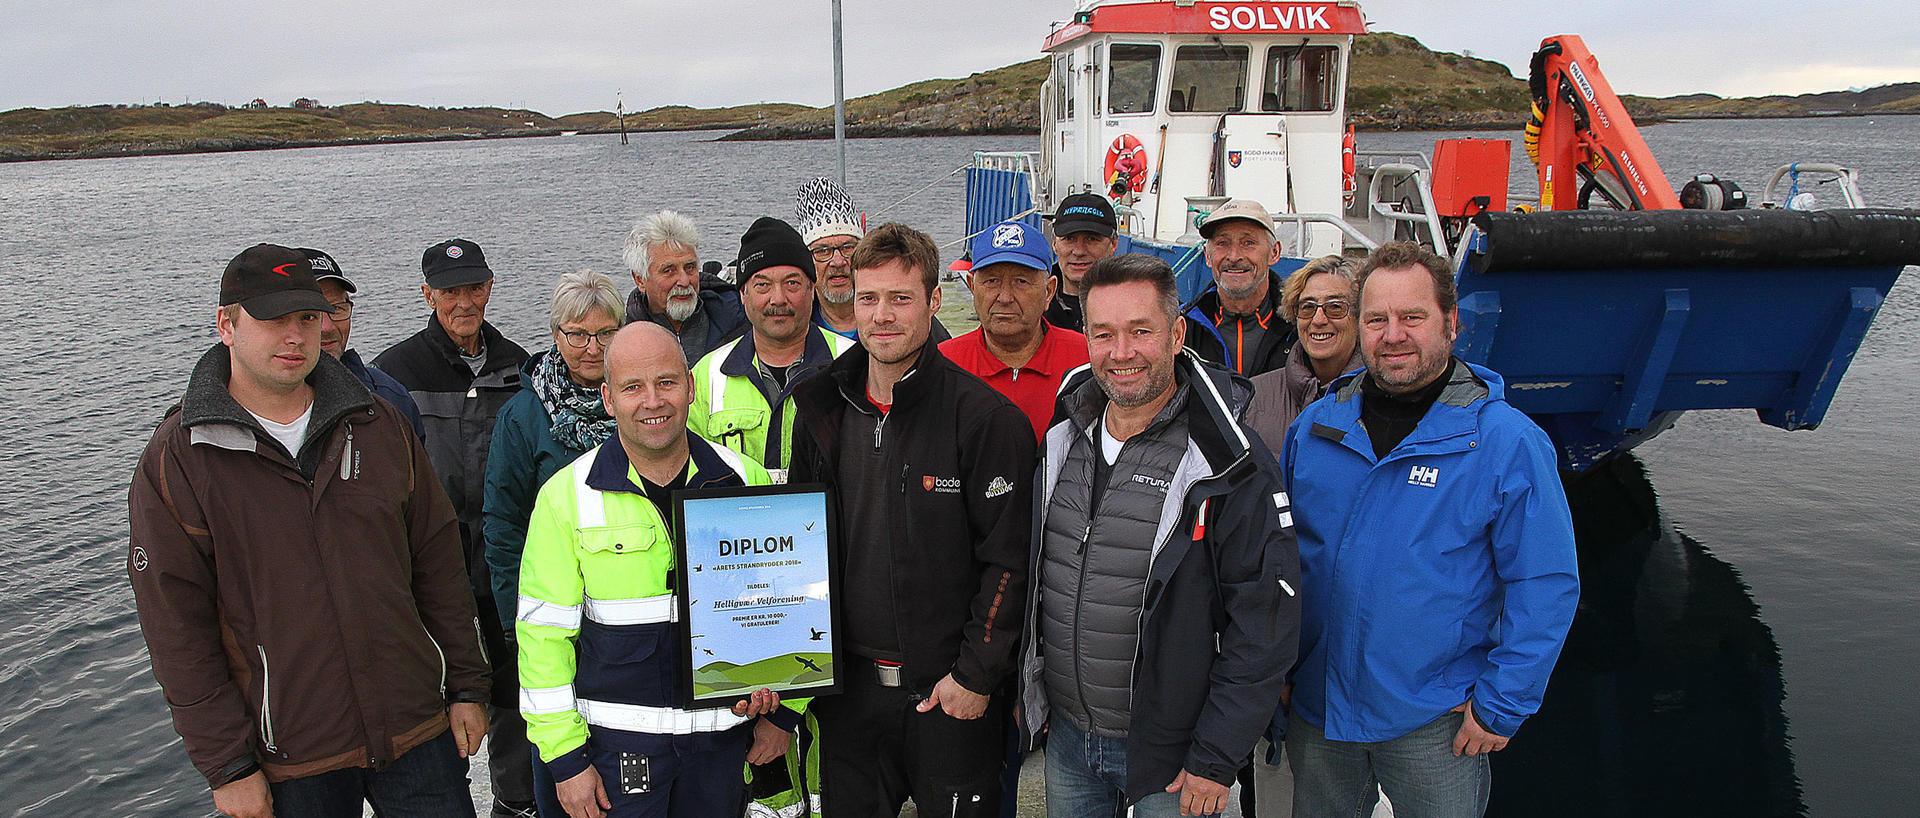 Befolkningen på Helligvær er strandryddere i verdensklasse.